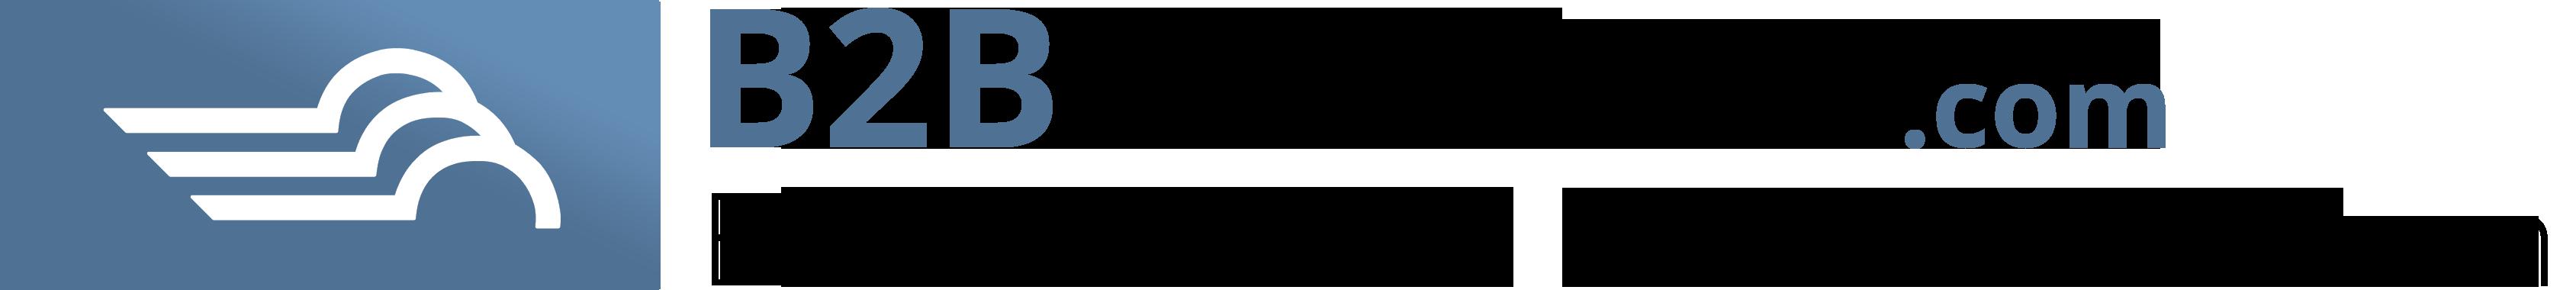 B2B E-Scooter